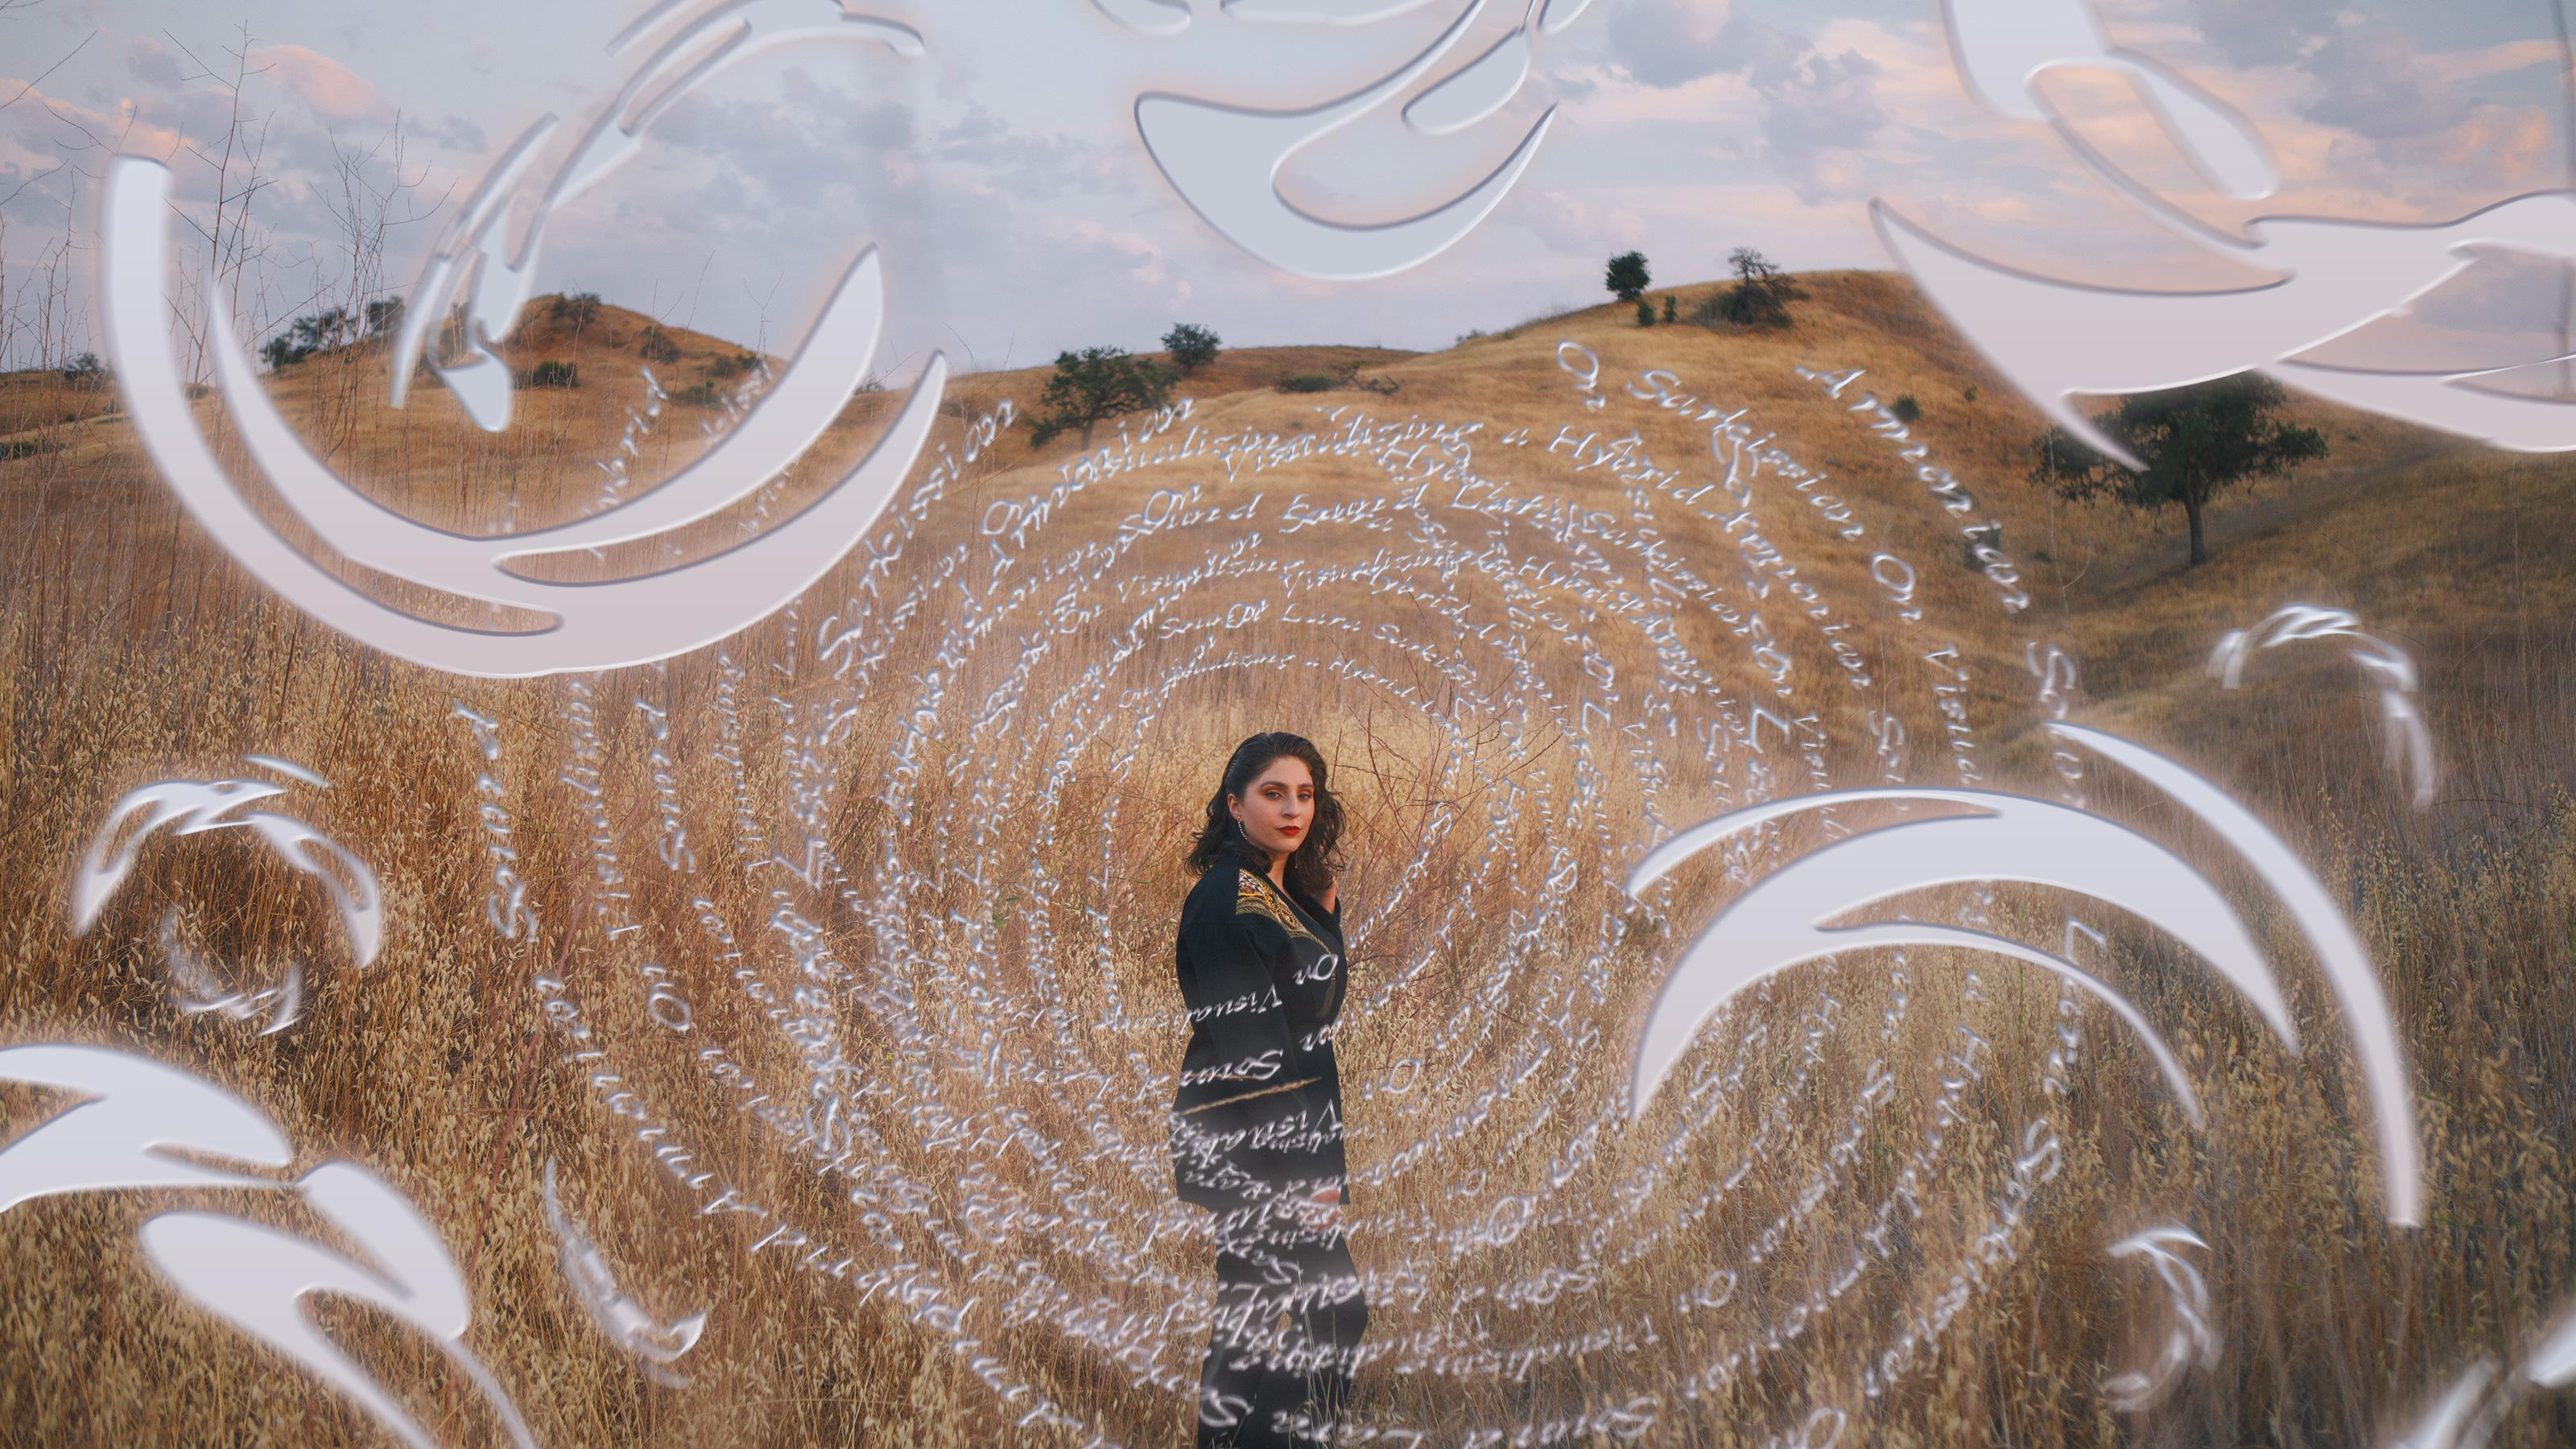 Lara Sarkissian On Visualizing a Hybrid Armenian Sound